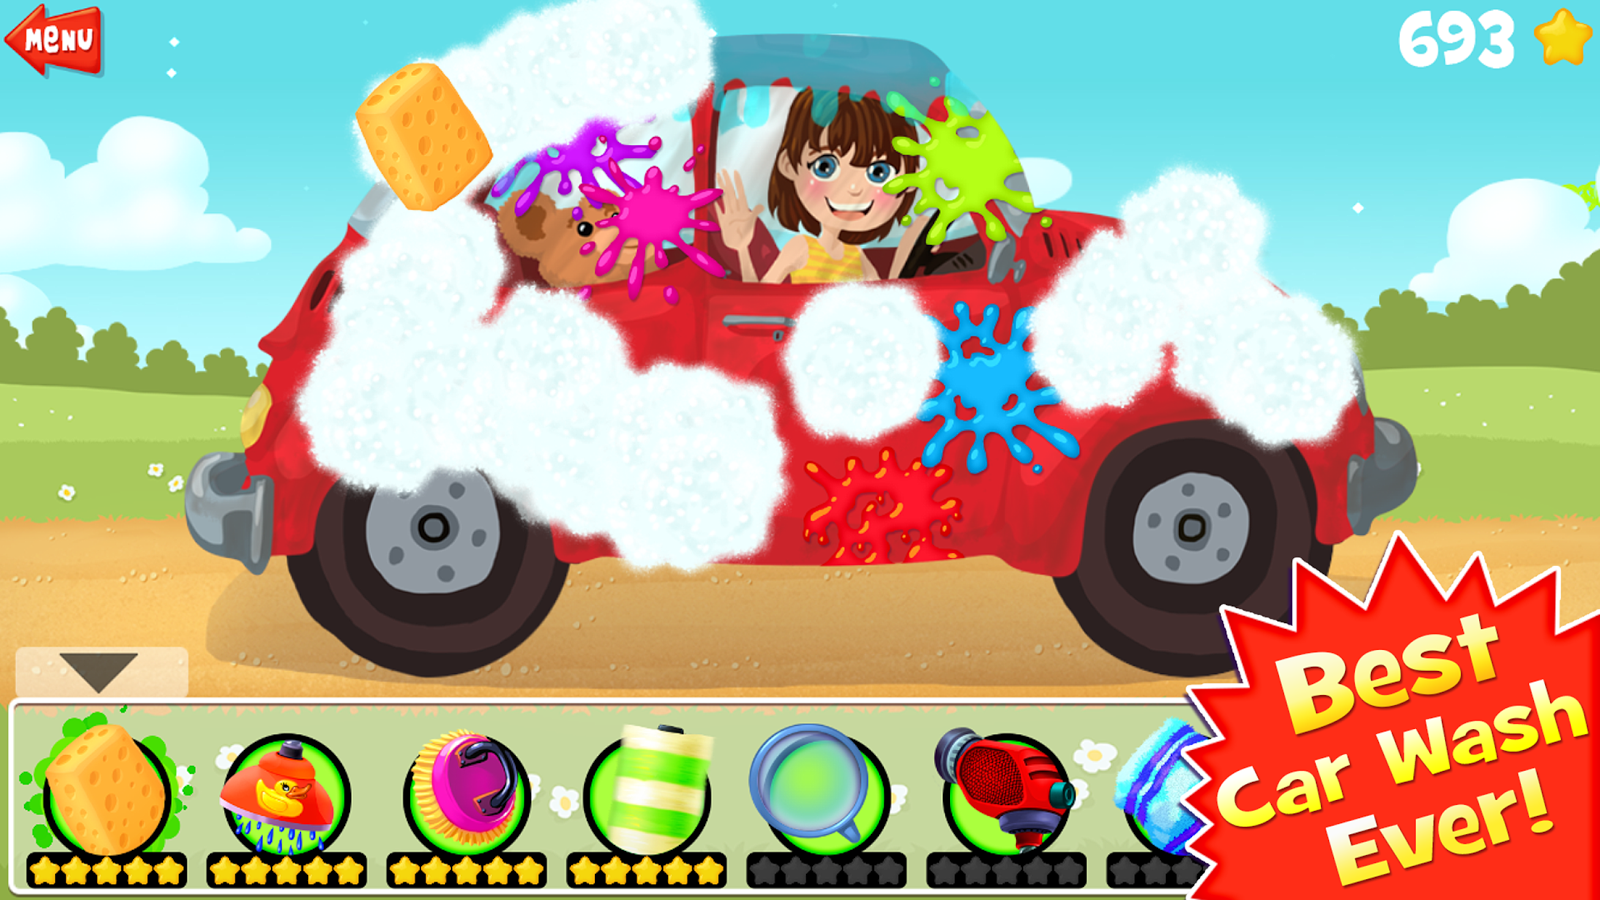 gratis auto spiel fur kinder app android kostenloser download gratis auto spiel fur kinder